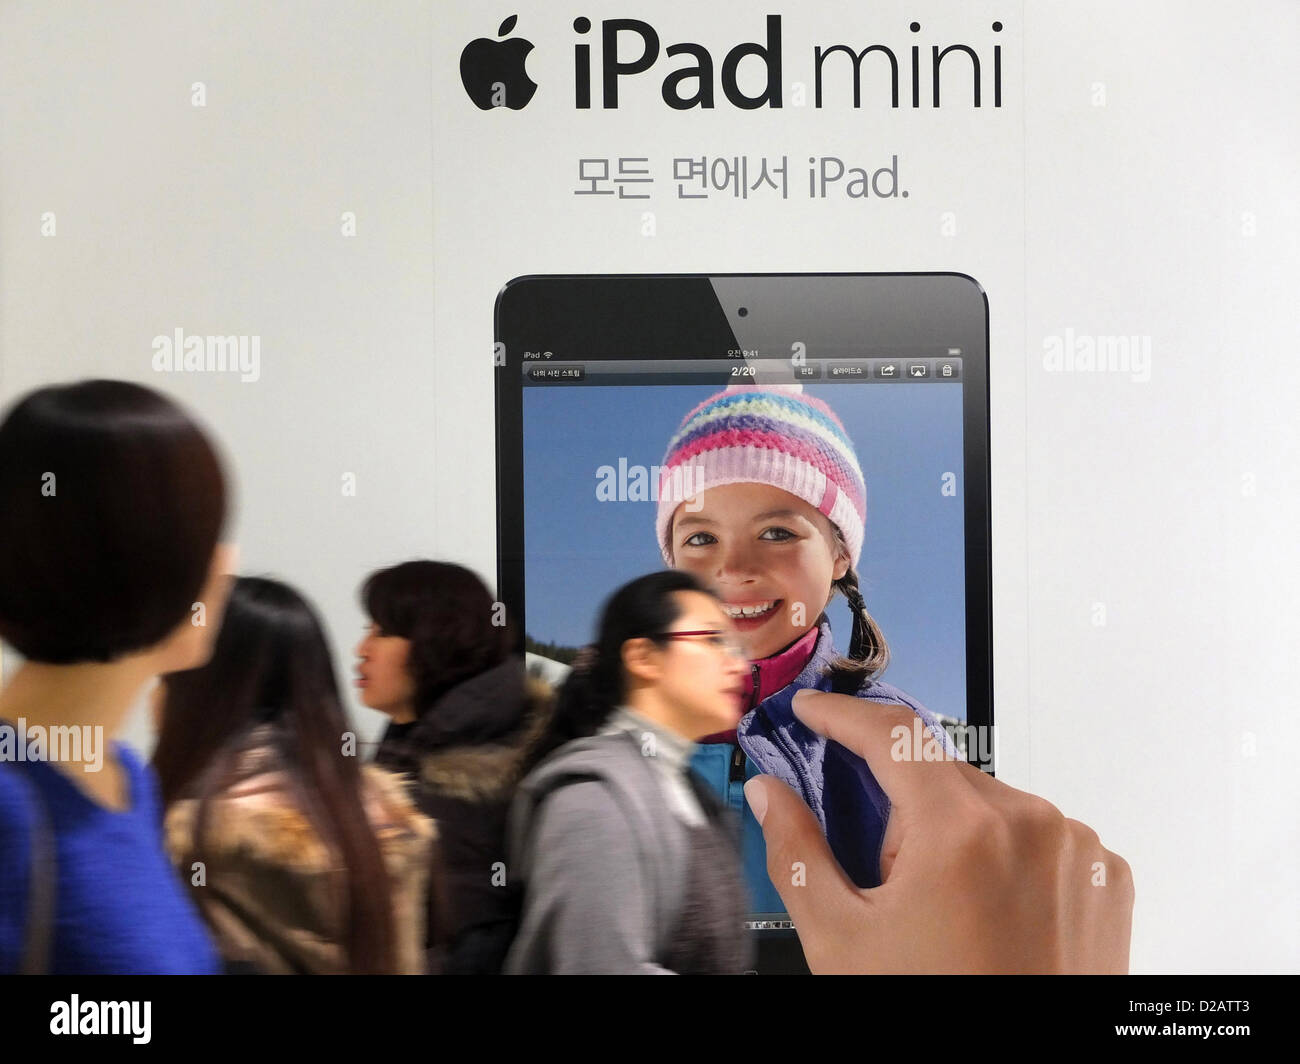 Corea del Sur: Apple iPad mini publicidad en Apple Store en Seúl Foto de stock